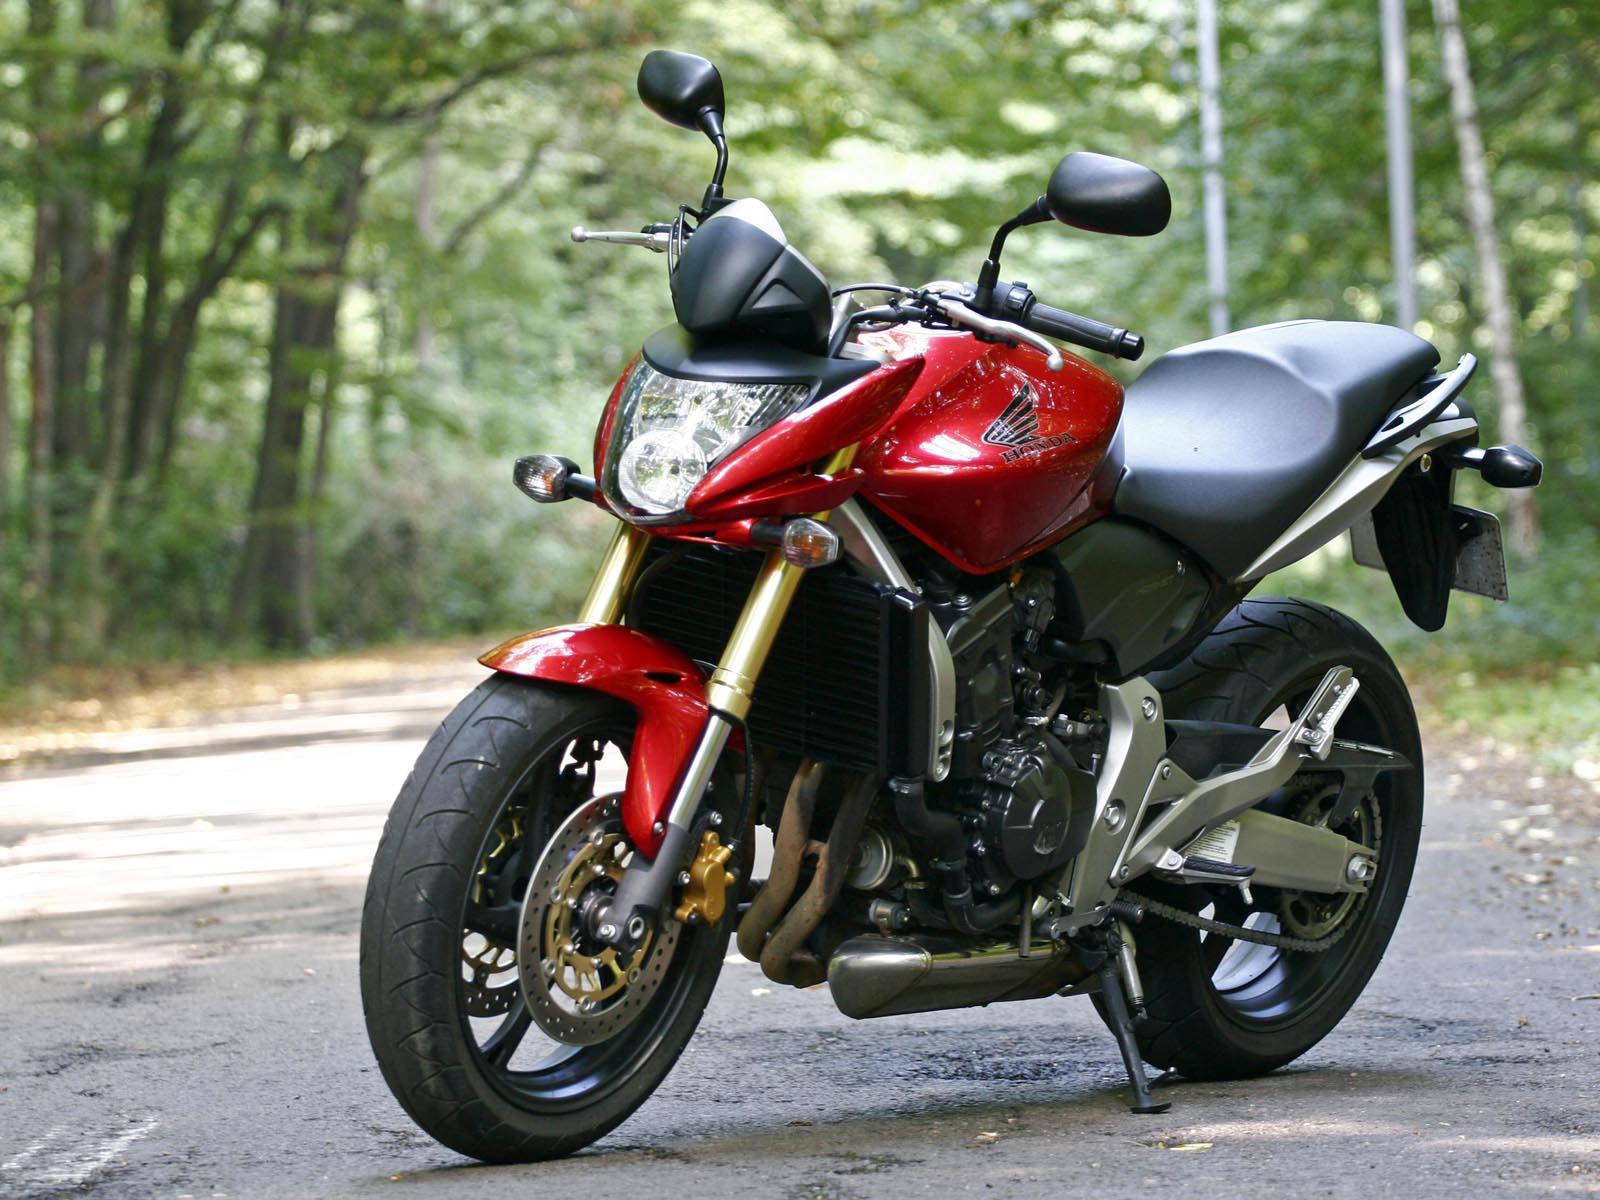 Обзор нейкеда Honda CB600F Hornet (1998-2006) / Honda ...